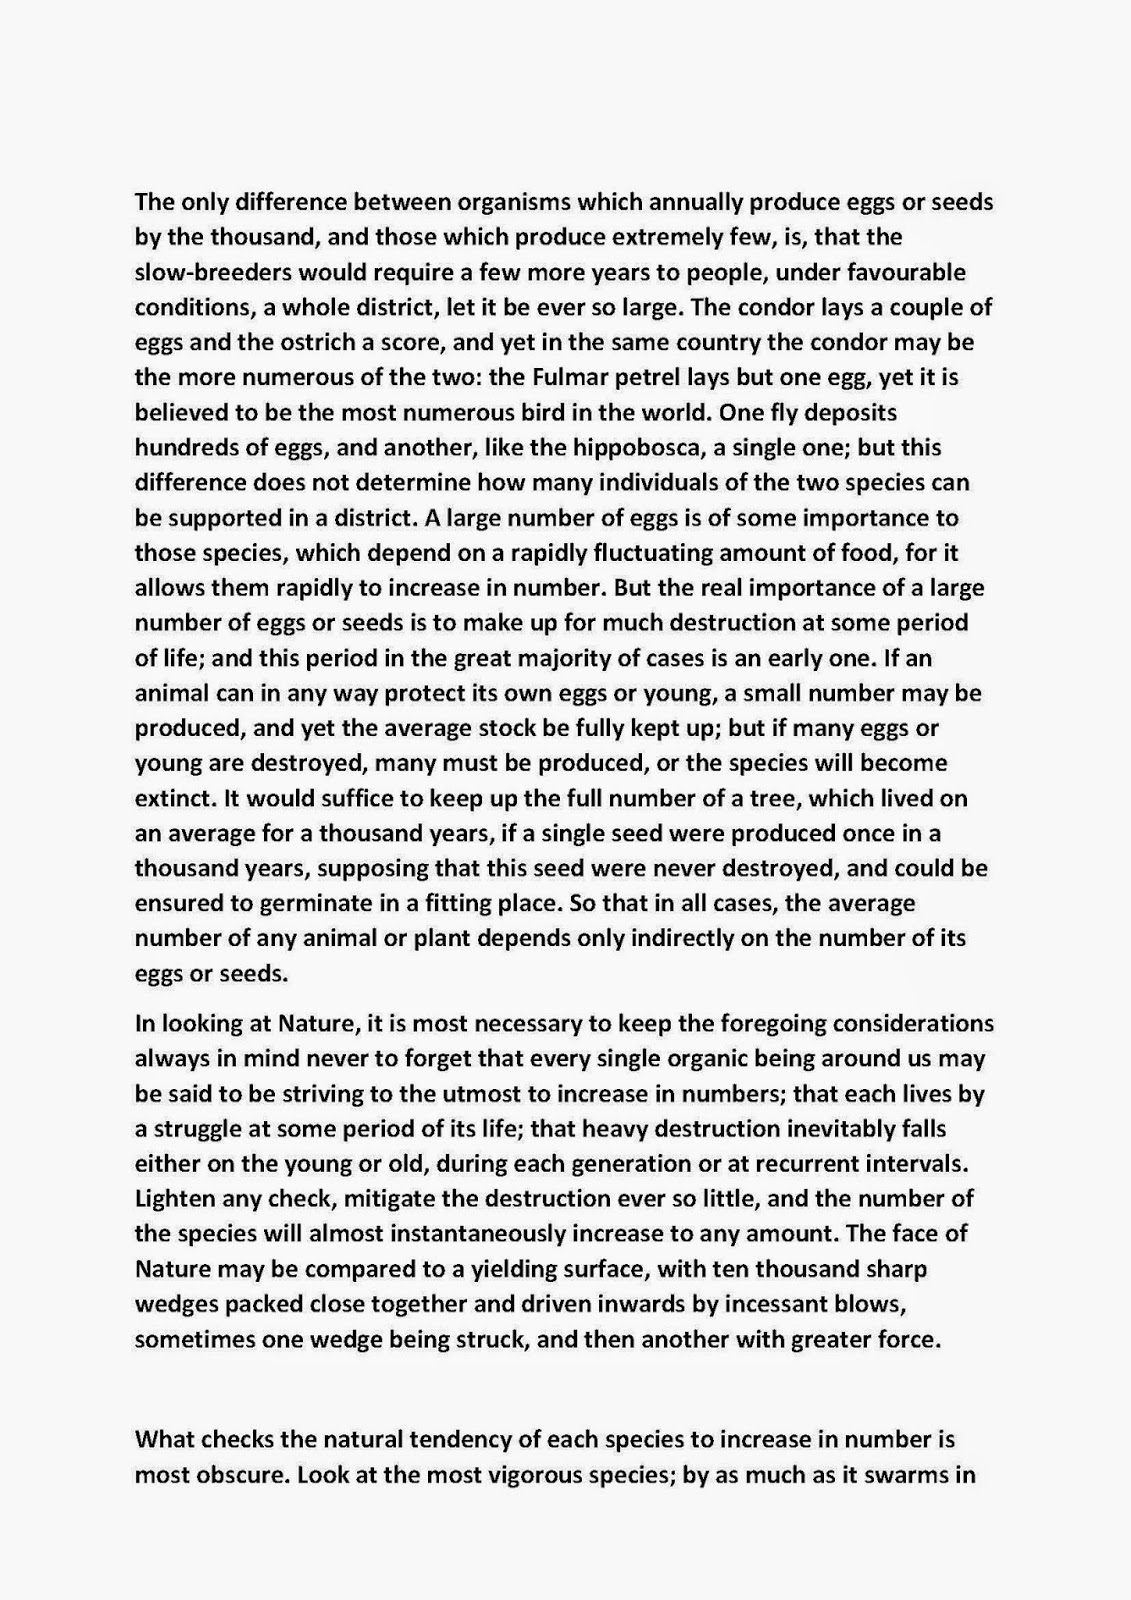 Ap english synthesis essay 2007